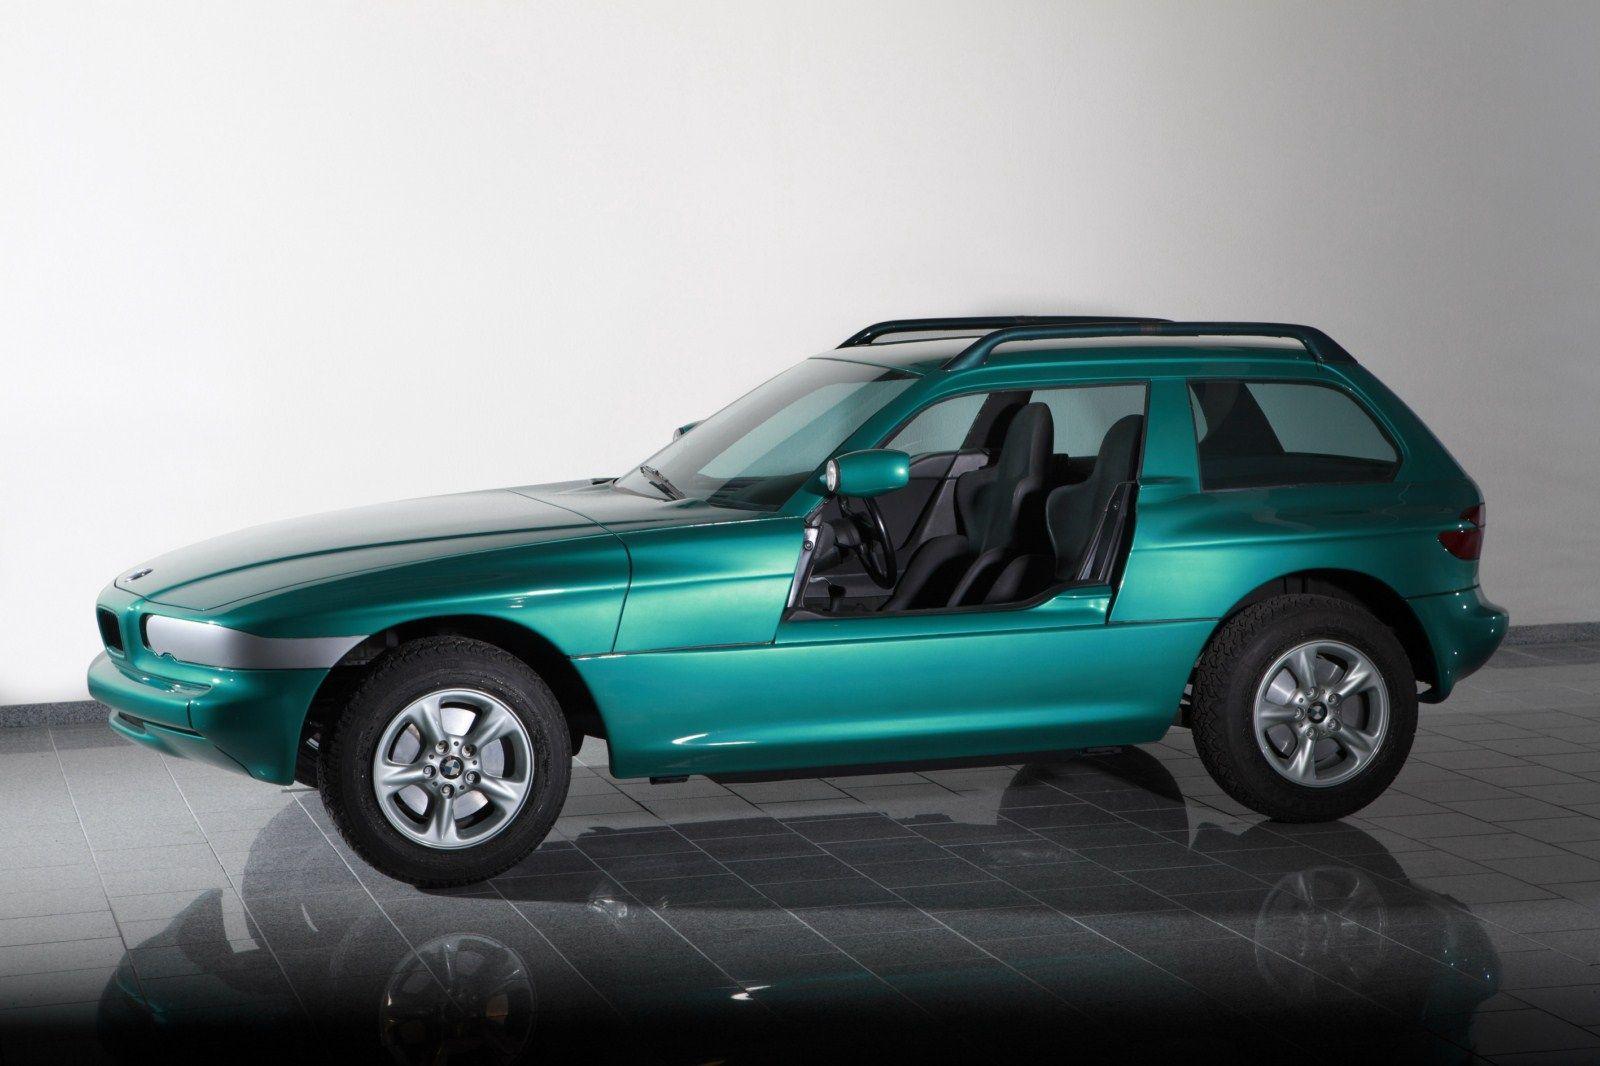 BMW Z1 Coupe   Shooting Brakes   Pinterest   Bmw z1 and BMW